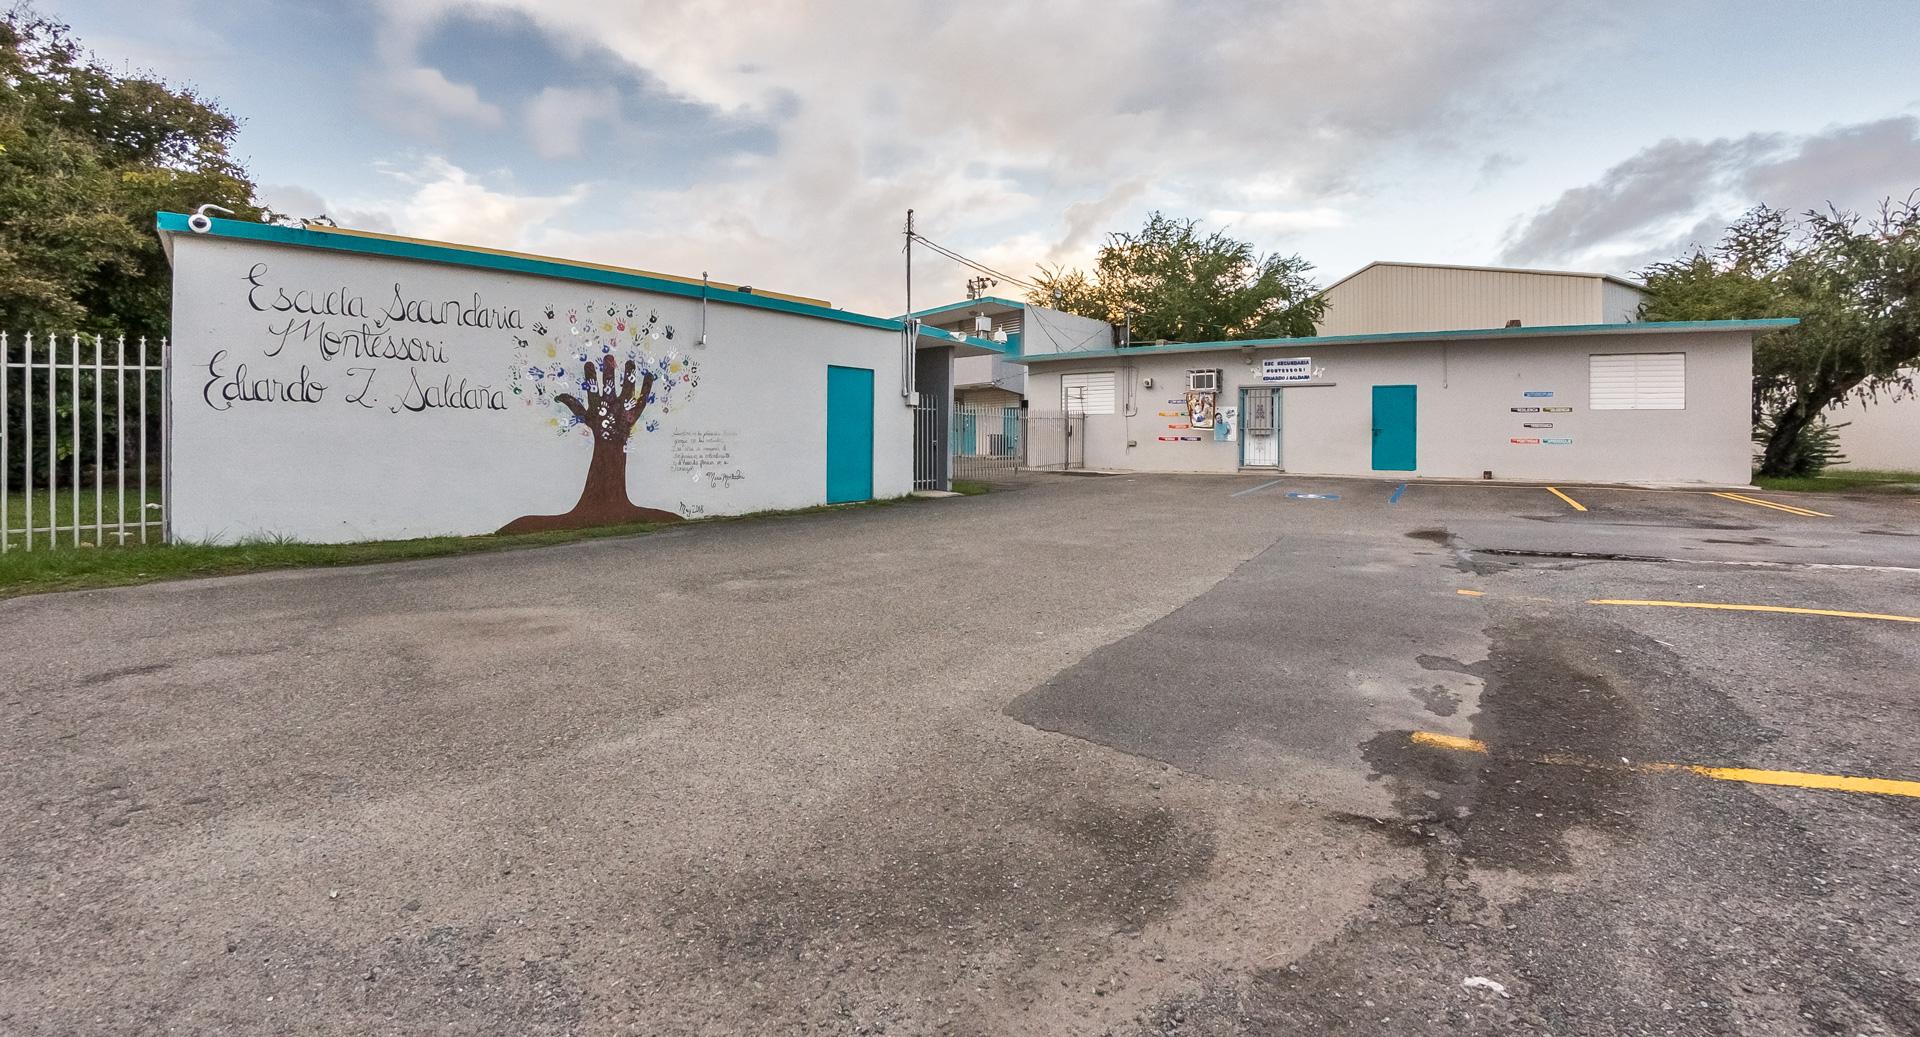 Escuela Secundaria Montessori Eduardo J. Saldaña